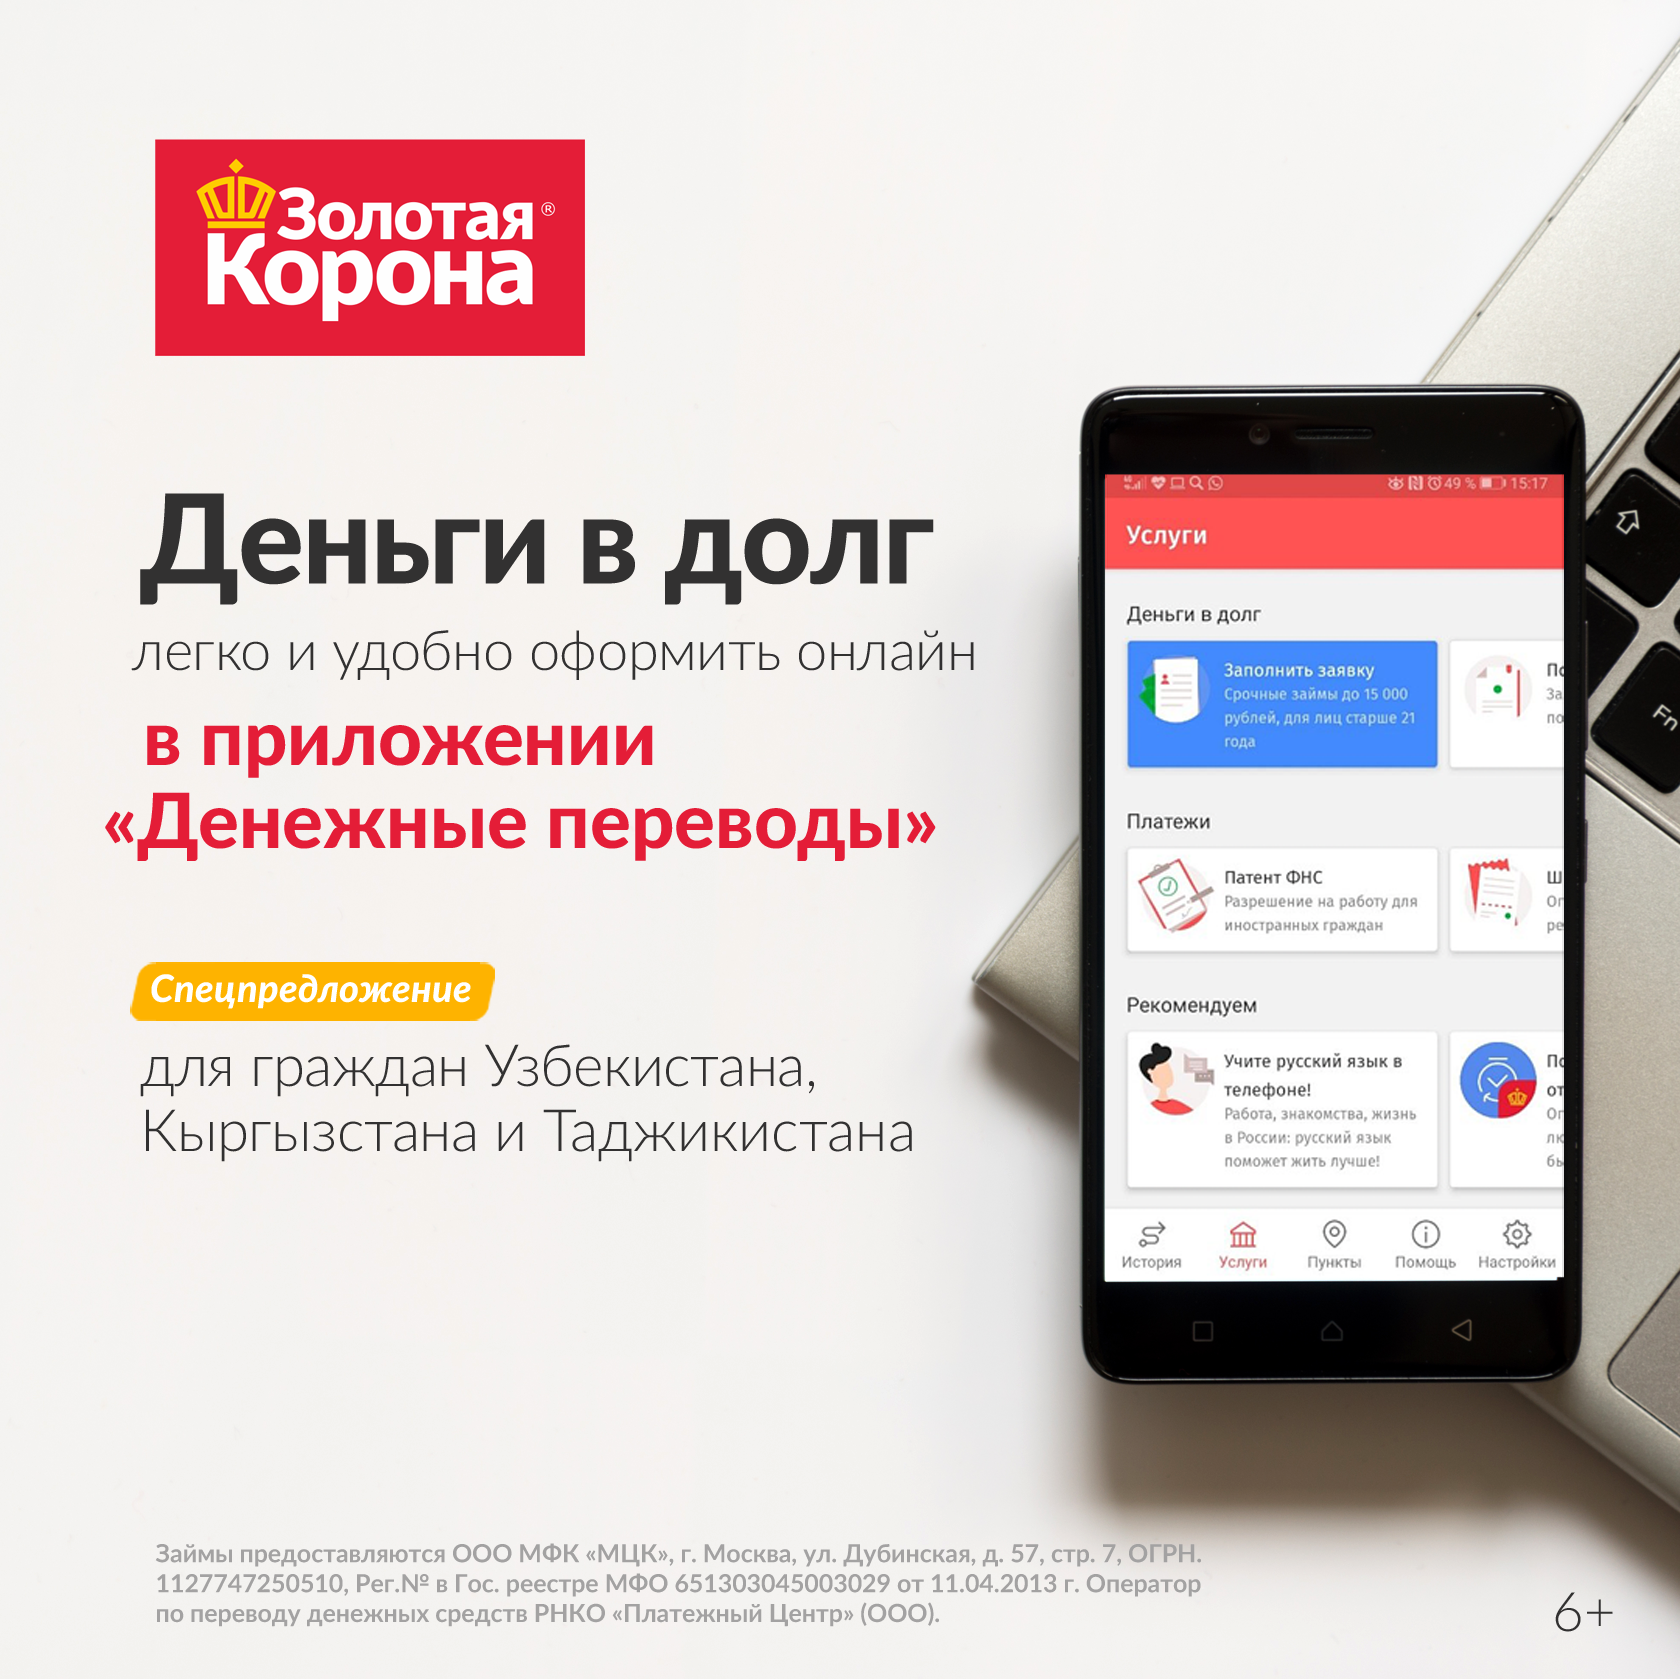 Кредит онлайн в москве гражданам рф взять кредит на 2 миллиона